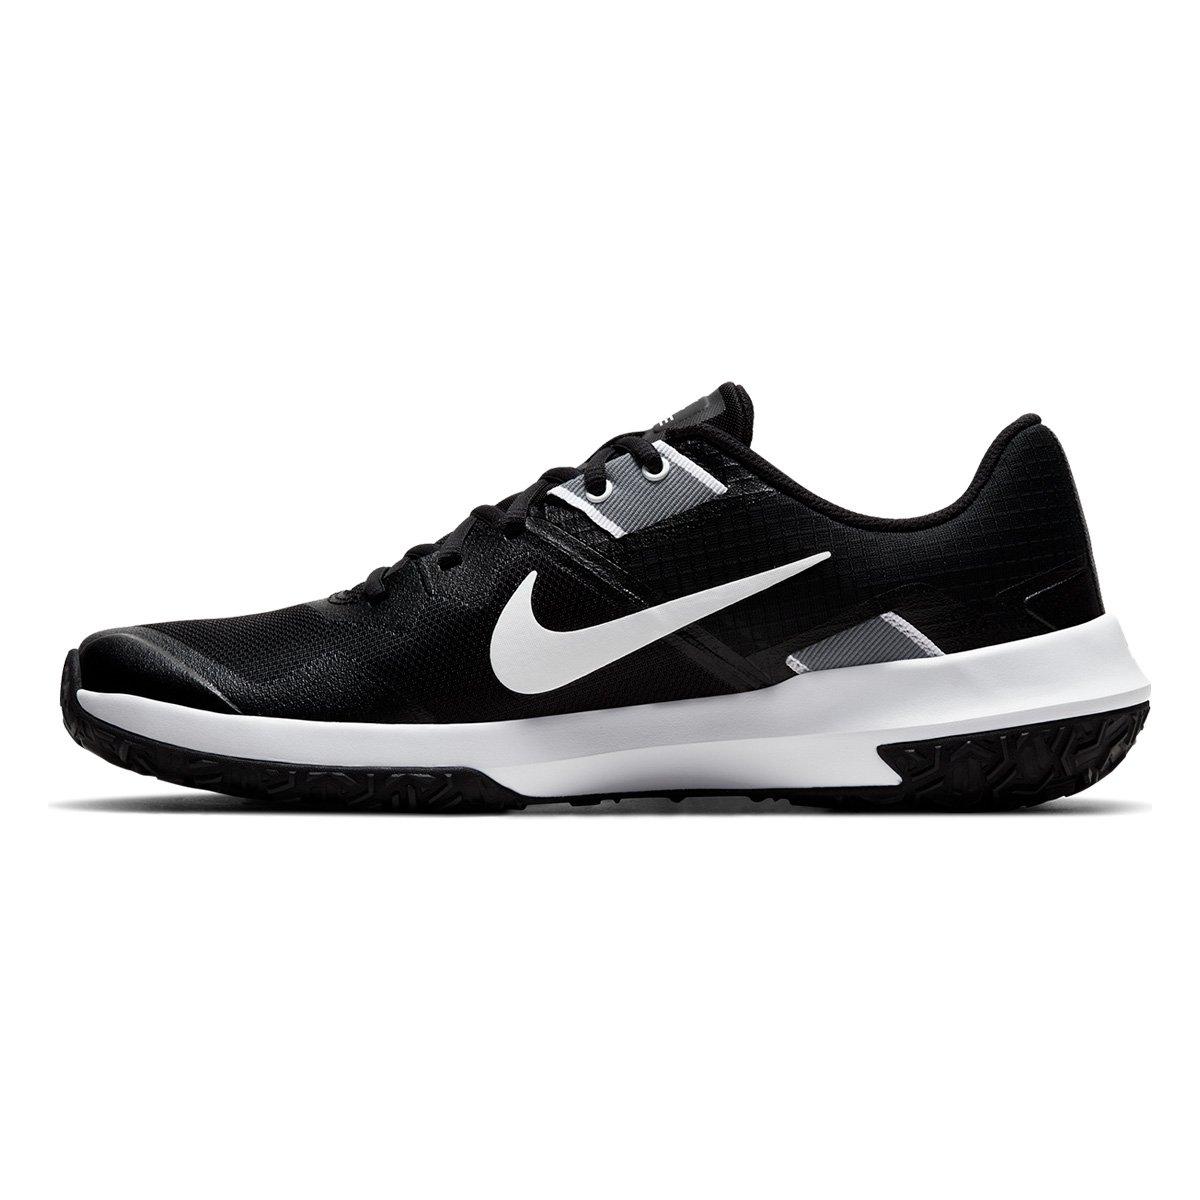 Tenis Nike Varsity Compete TR 3 Training Performance Academia